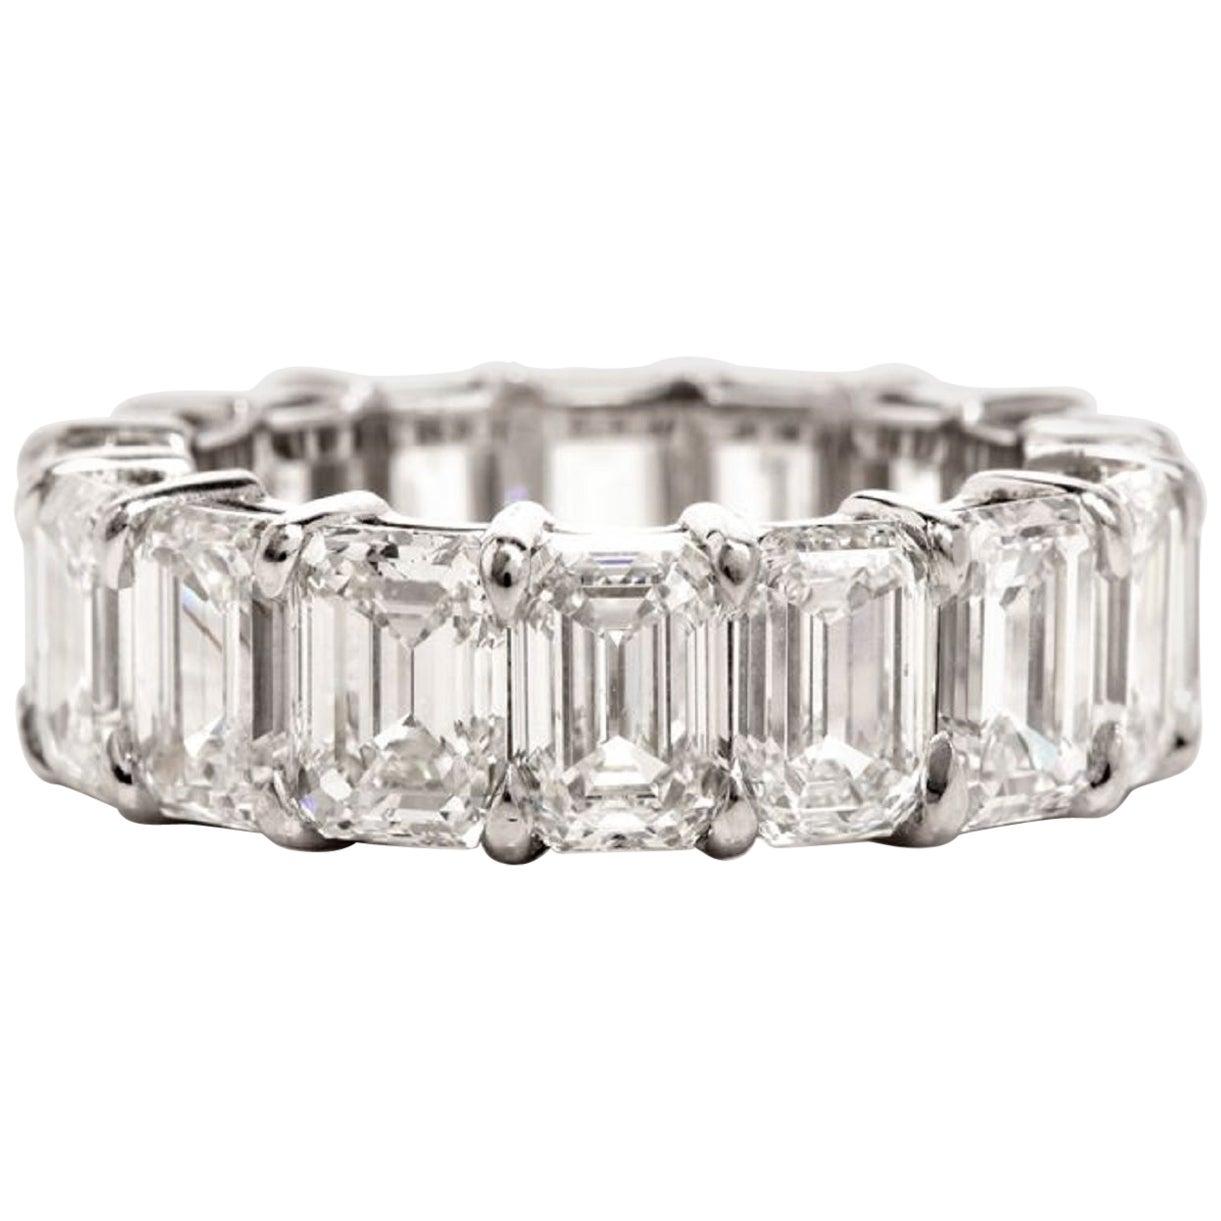 GIA Certified 12 Carat Emerald Cut Diamond Eternity Band Ring Platinum